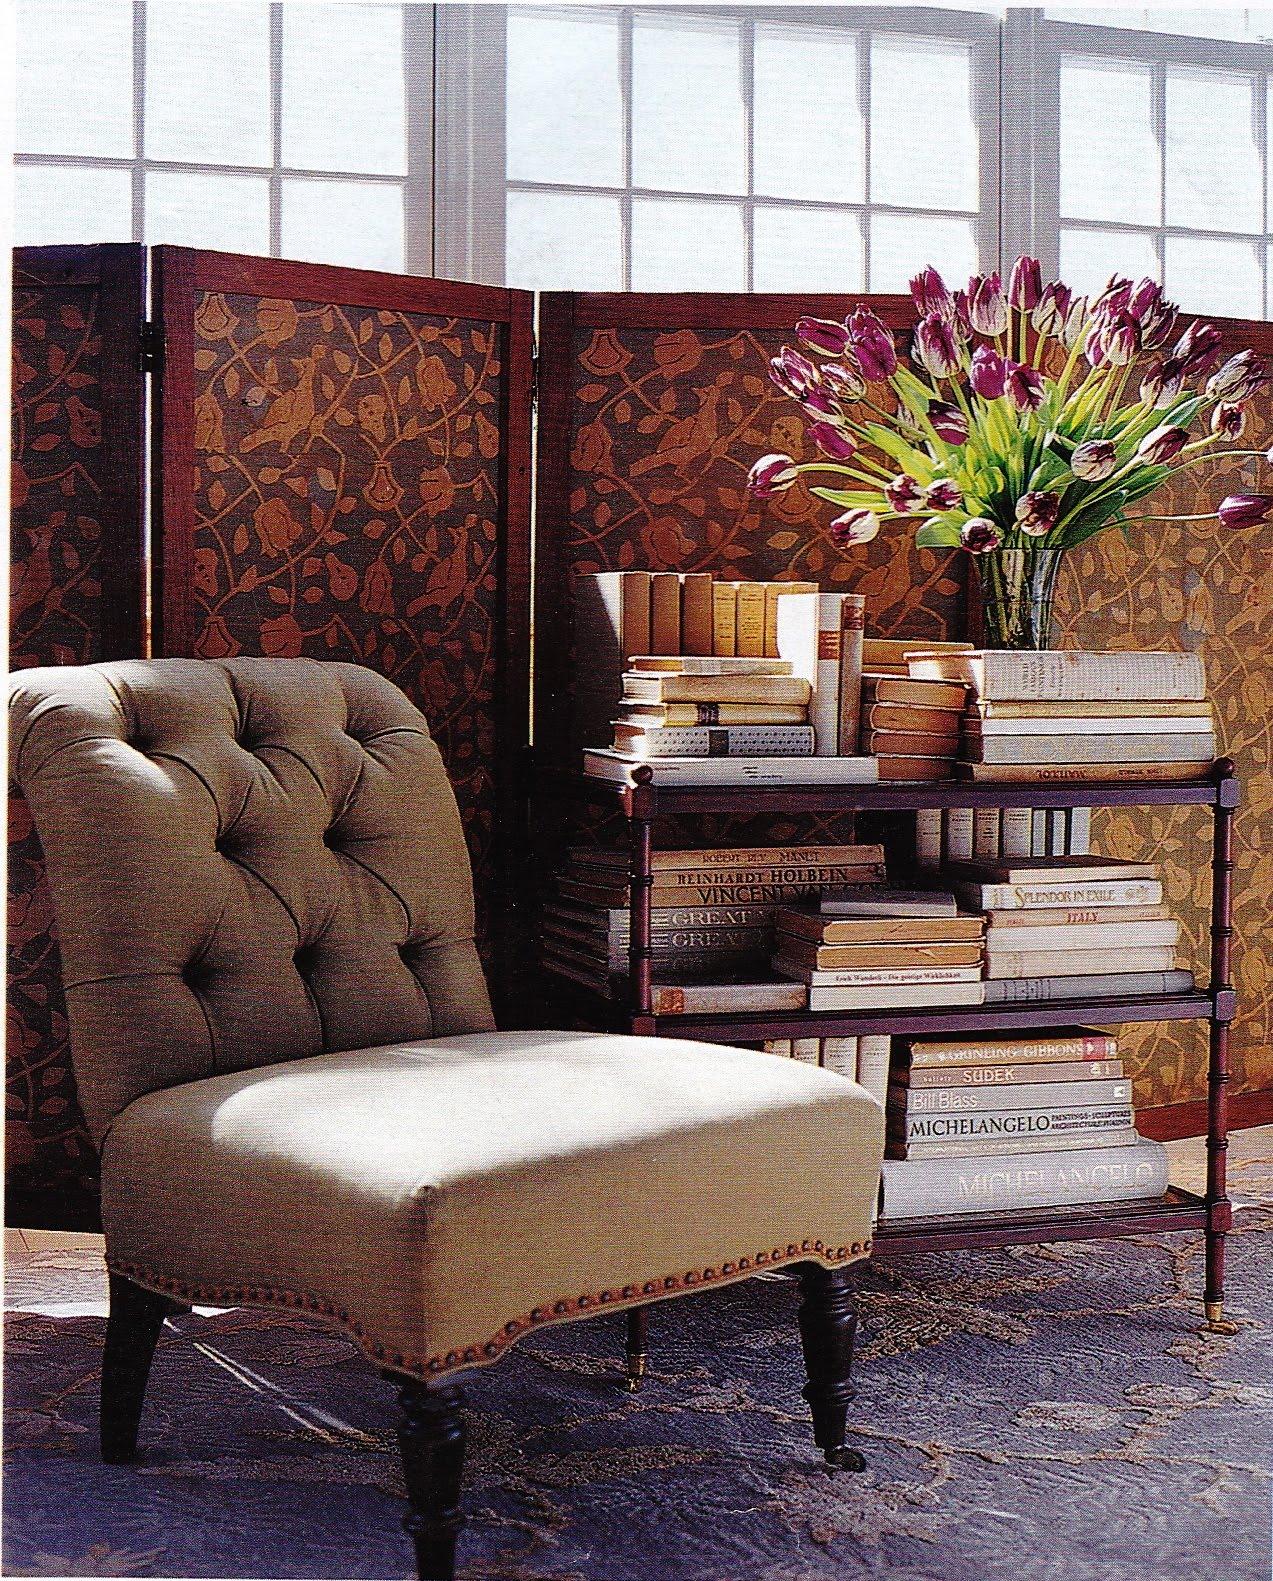 Habitat For Humanity: The Good [Home] Stuff: Living Room